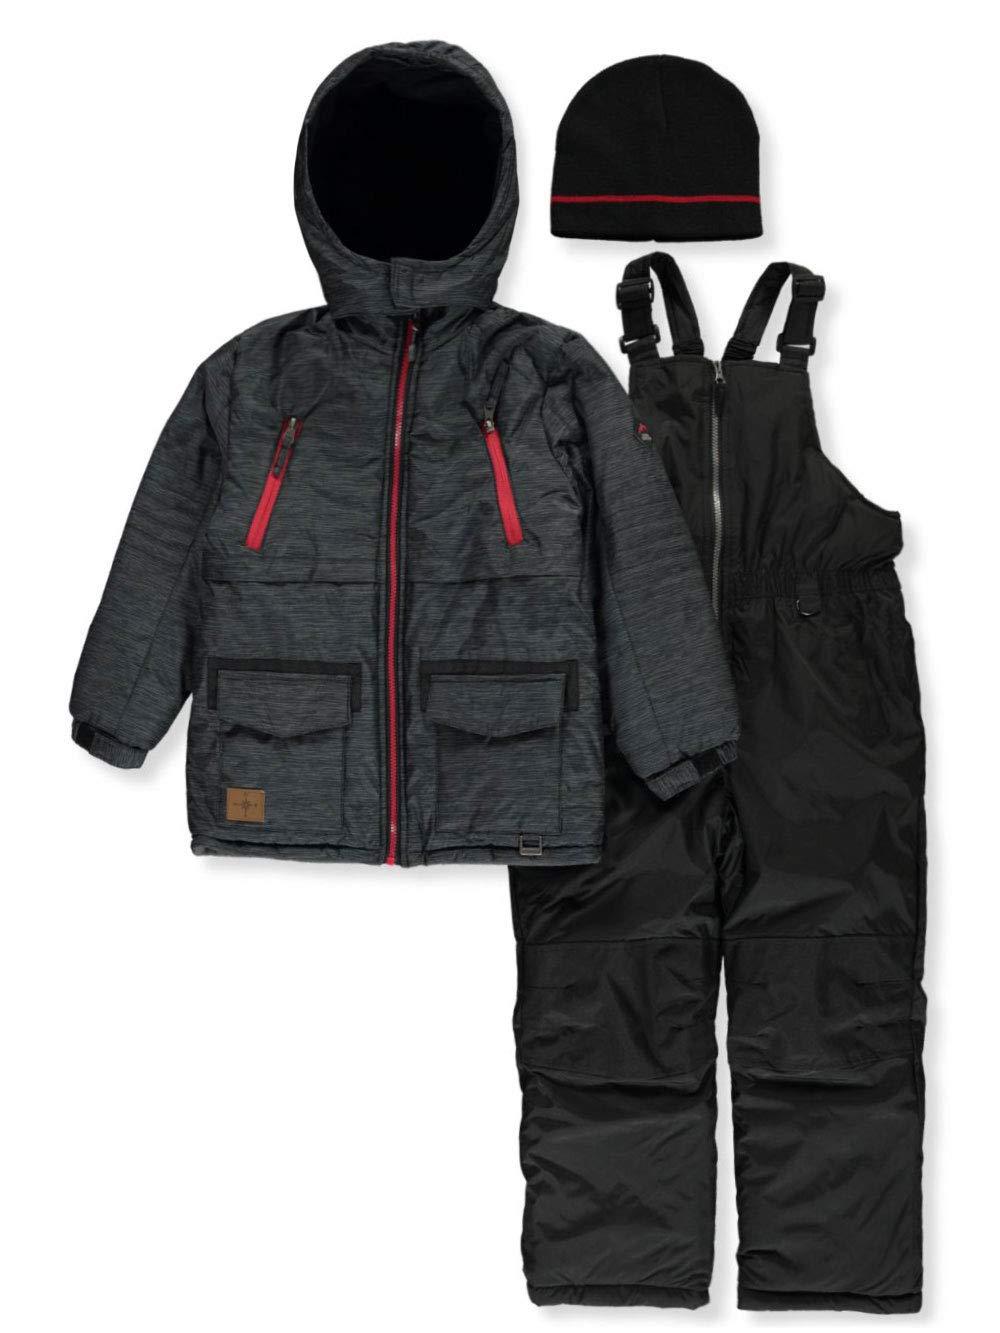 iXtreme Boys' Big Better Snowsuit, Black, 14/16 by iXtreme